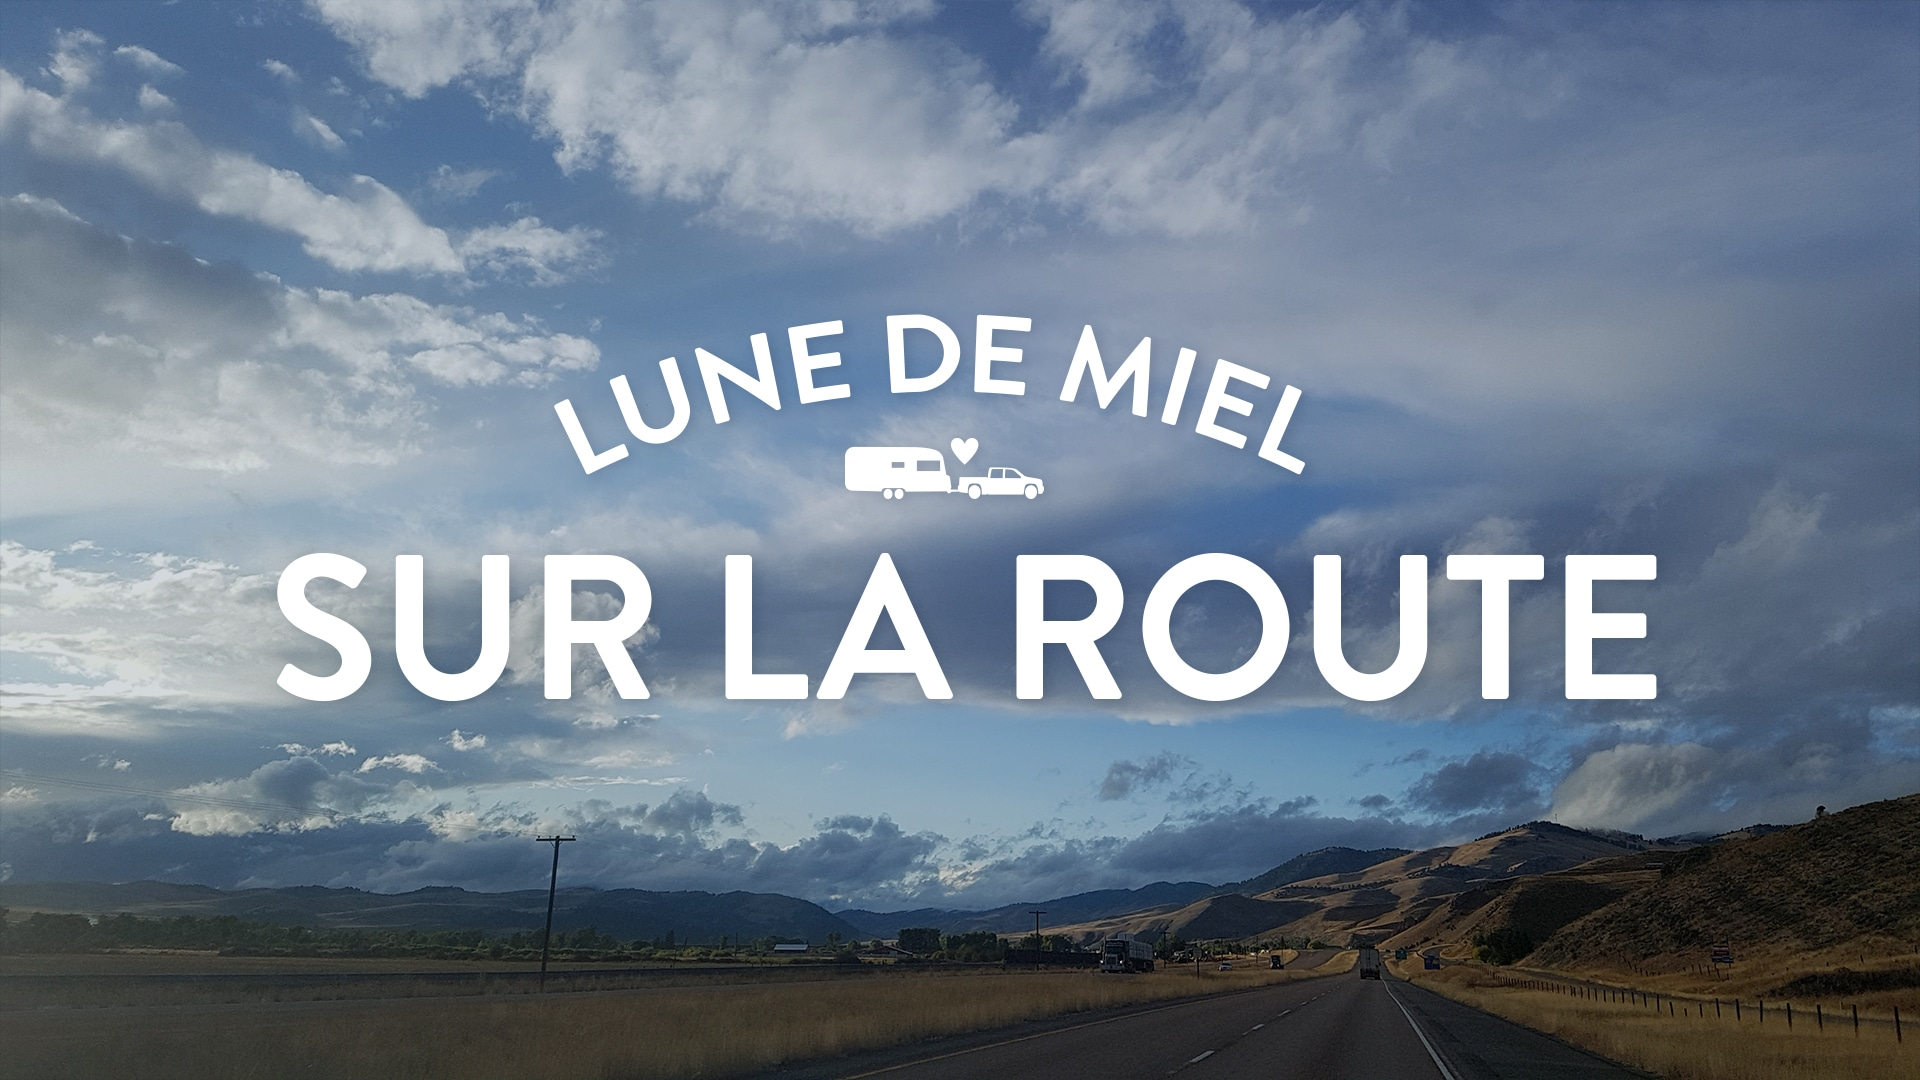 Picture of countryside with text Lune de miel sur la route overlaid